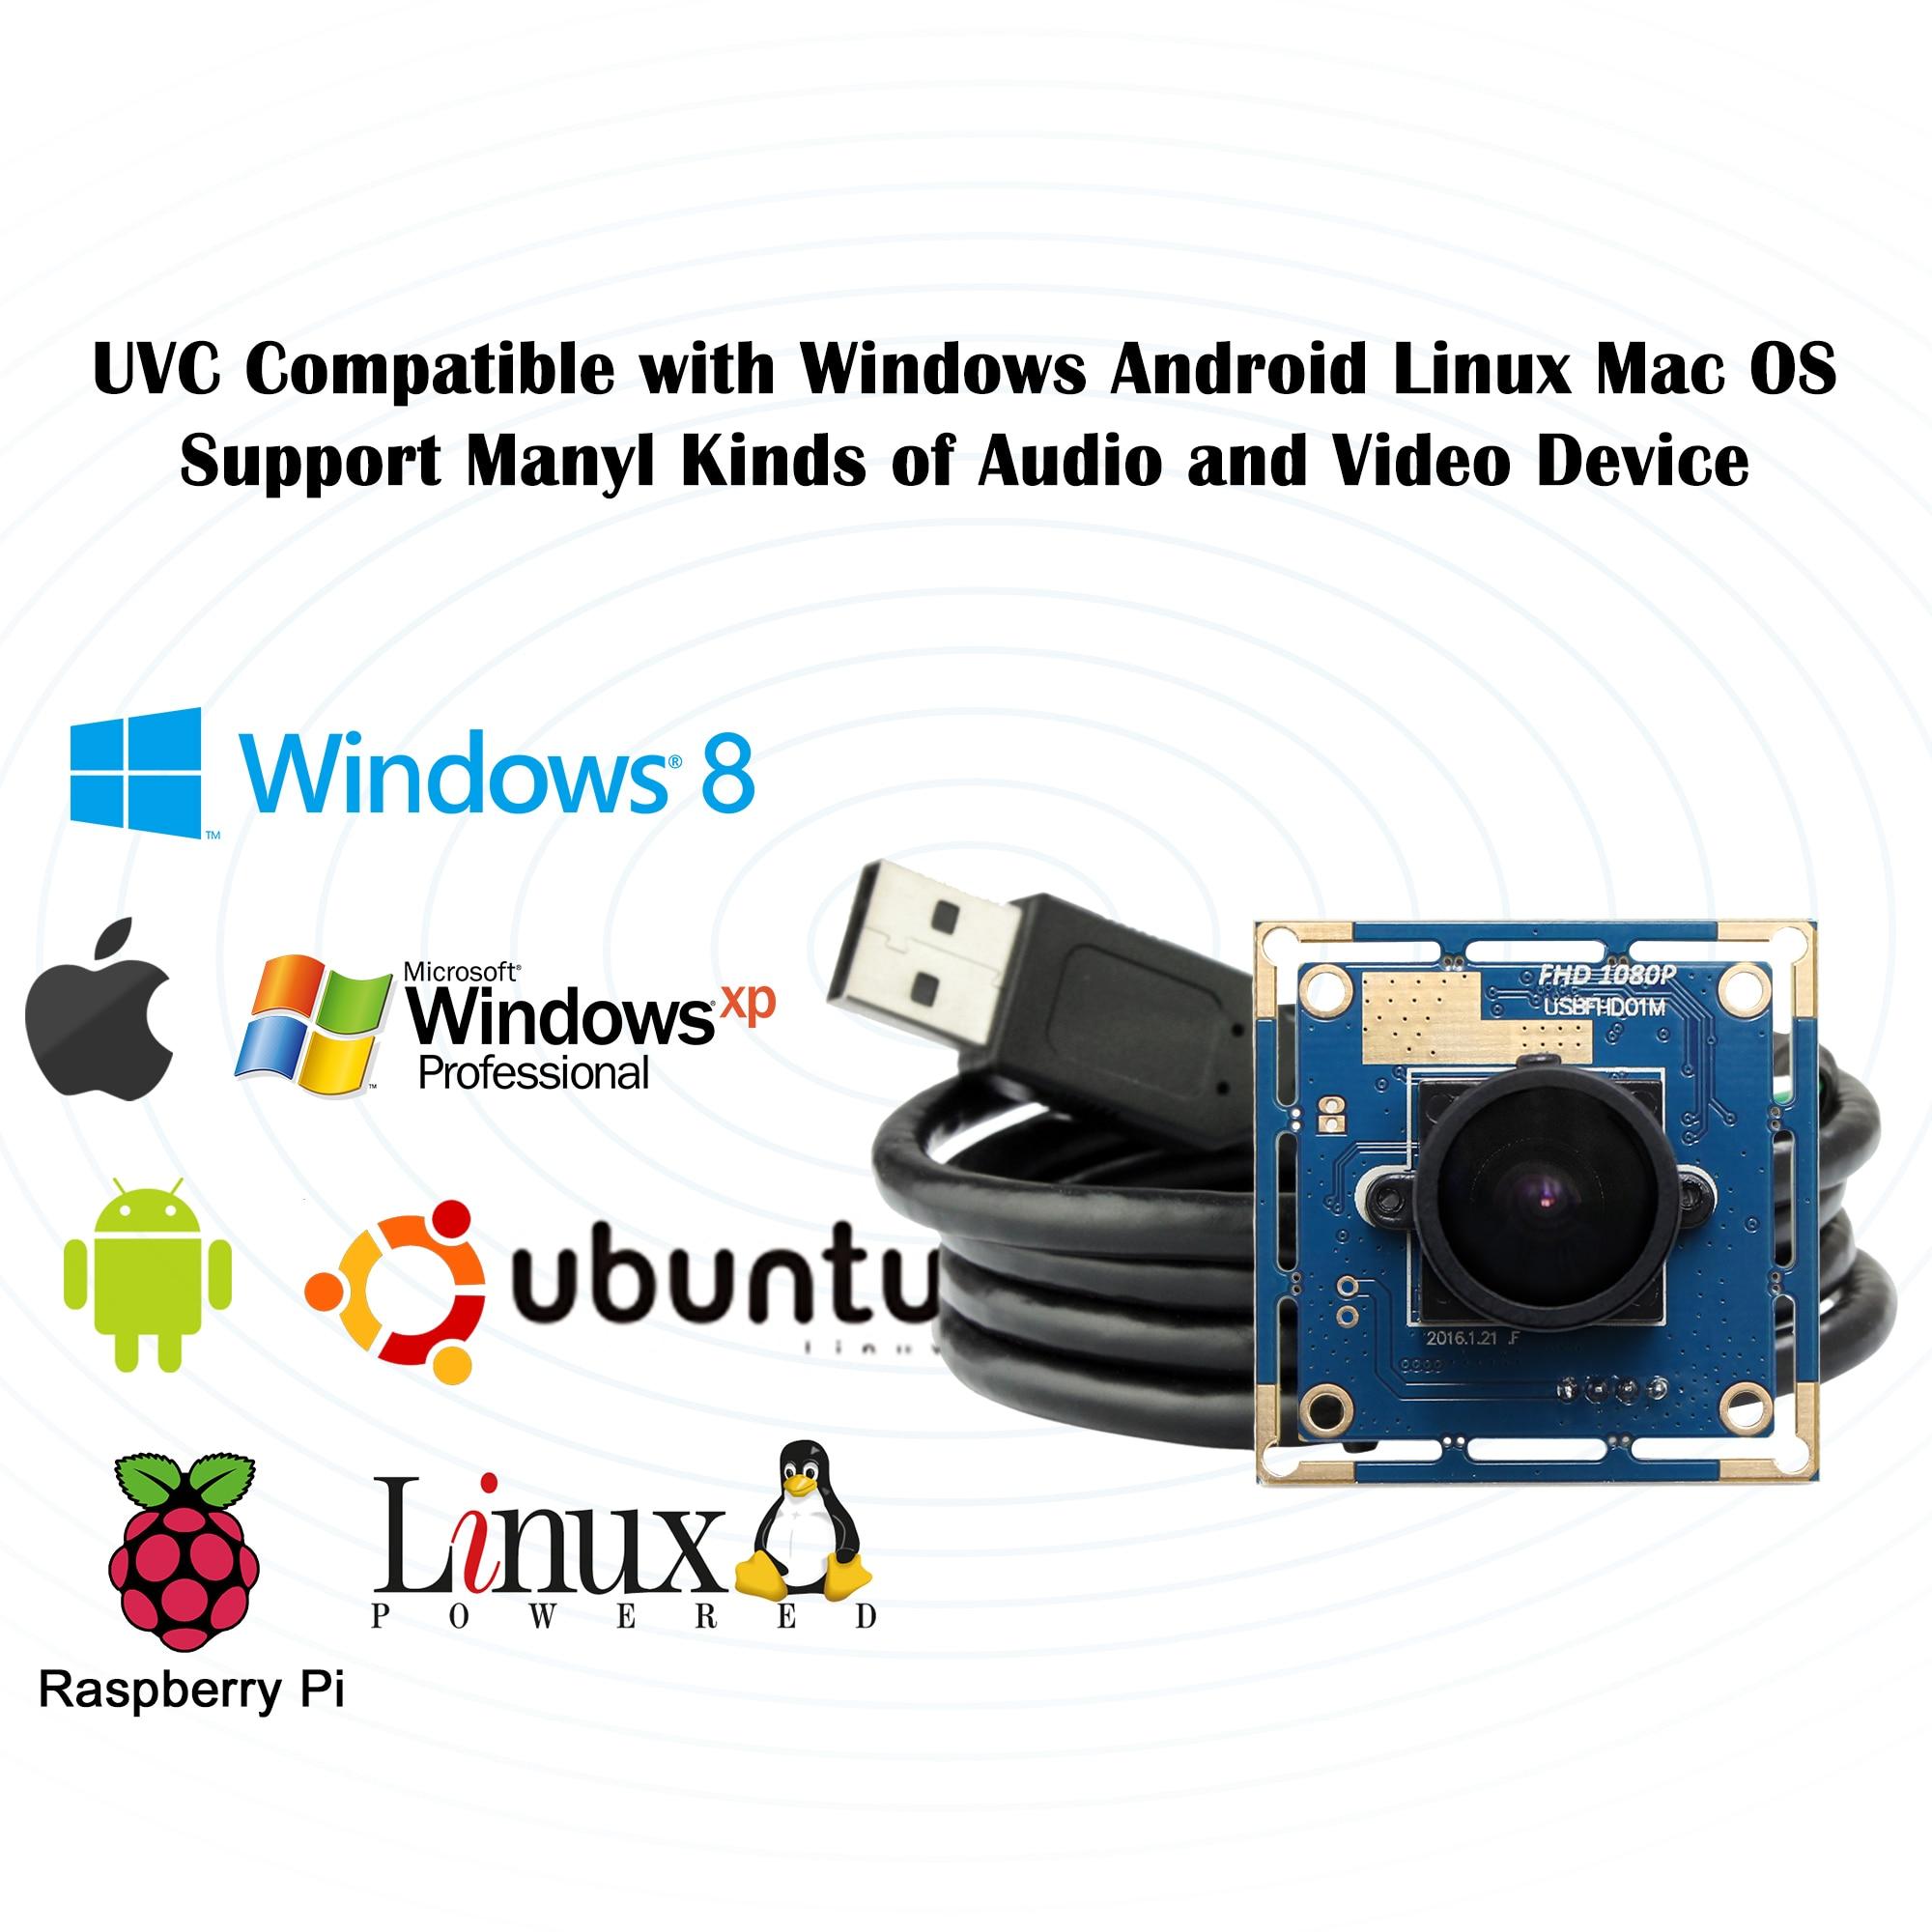 Cámara web de seguridad 2MP 1080P Mini CMOS OV2710 UVC OTG 30fps/60fps/120fps 170 grados lente ojo de pez gran angular CCTV módulo de cámara